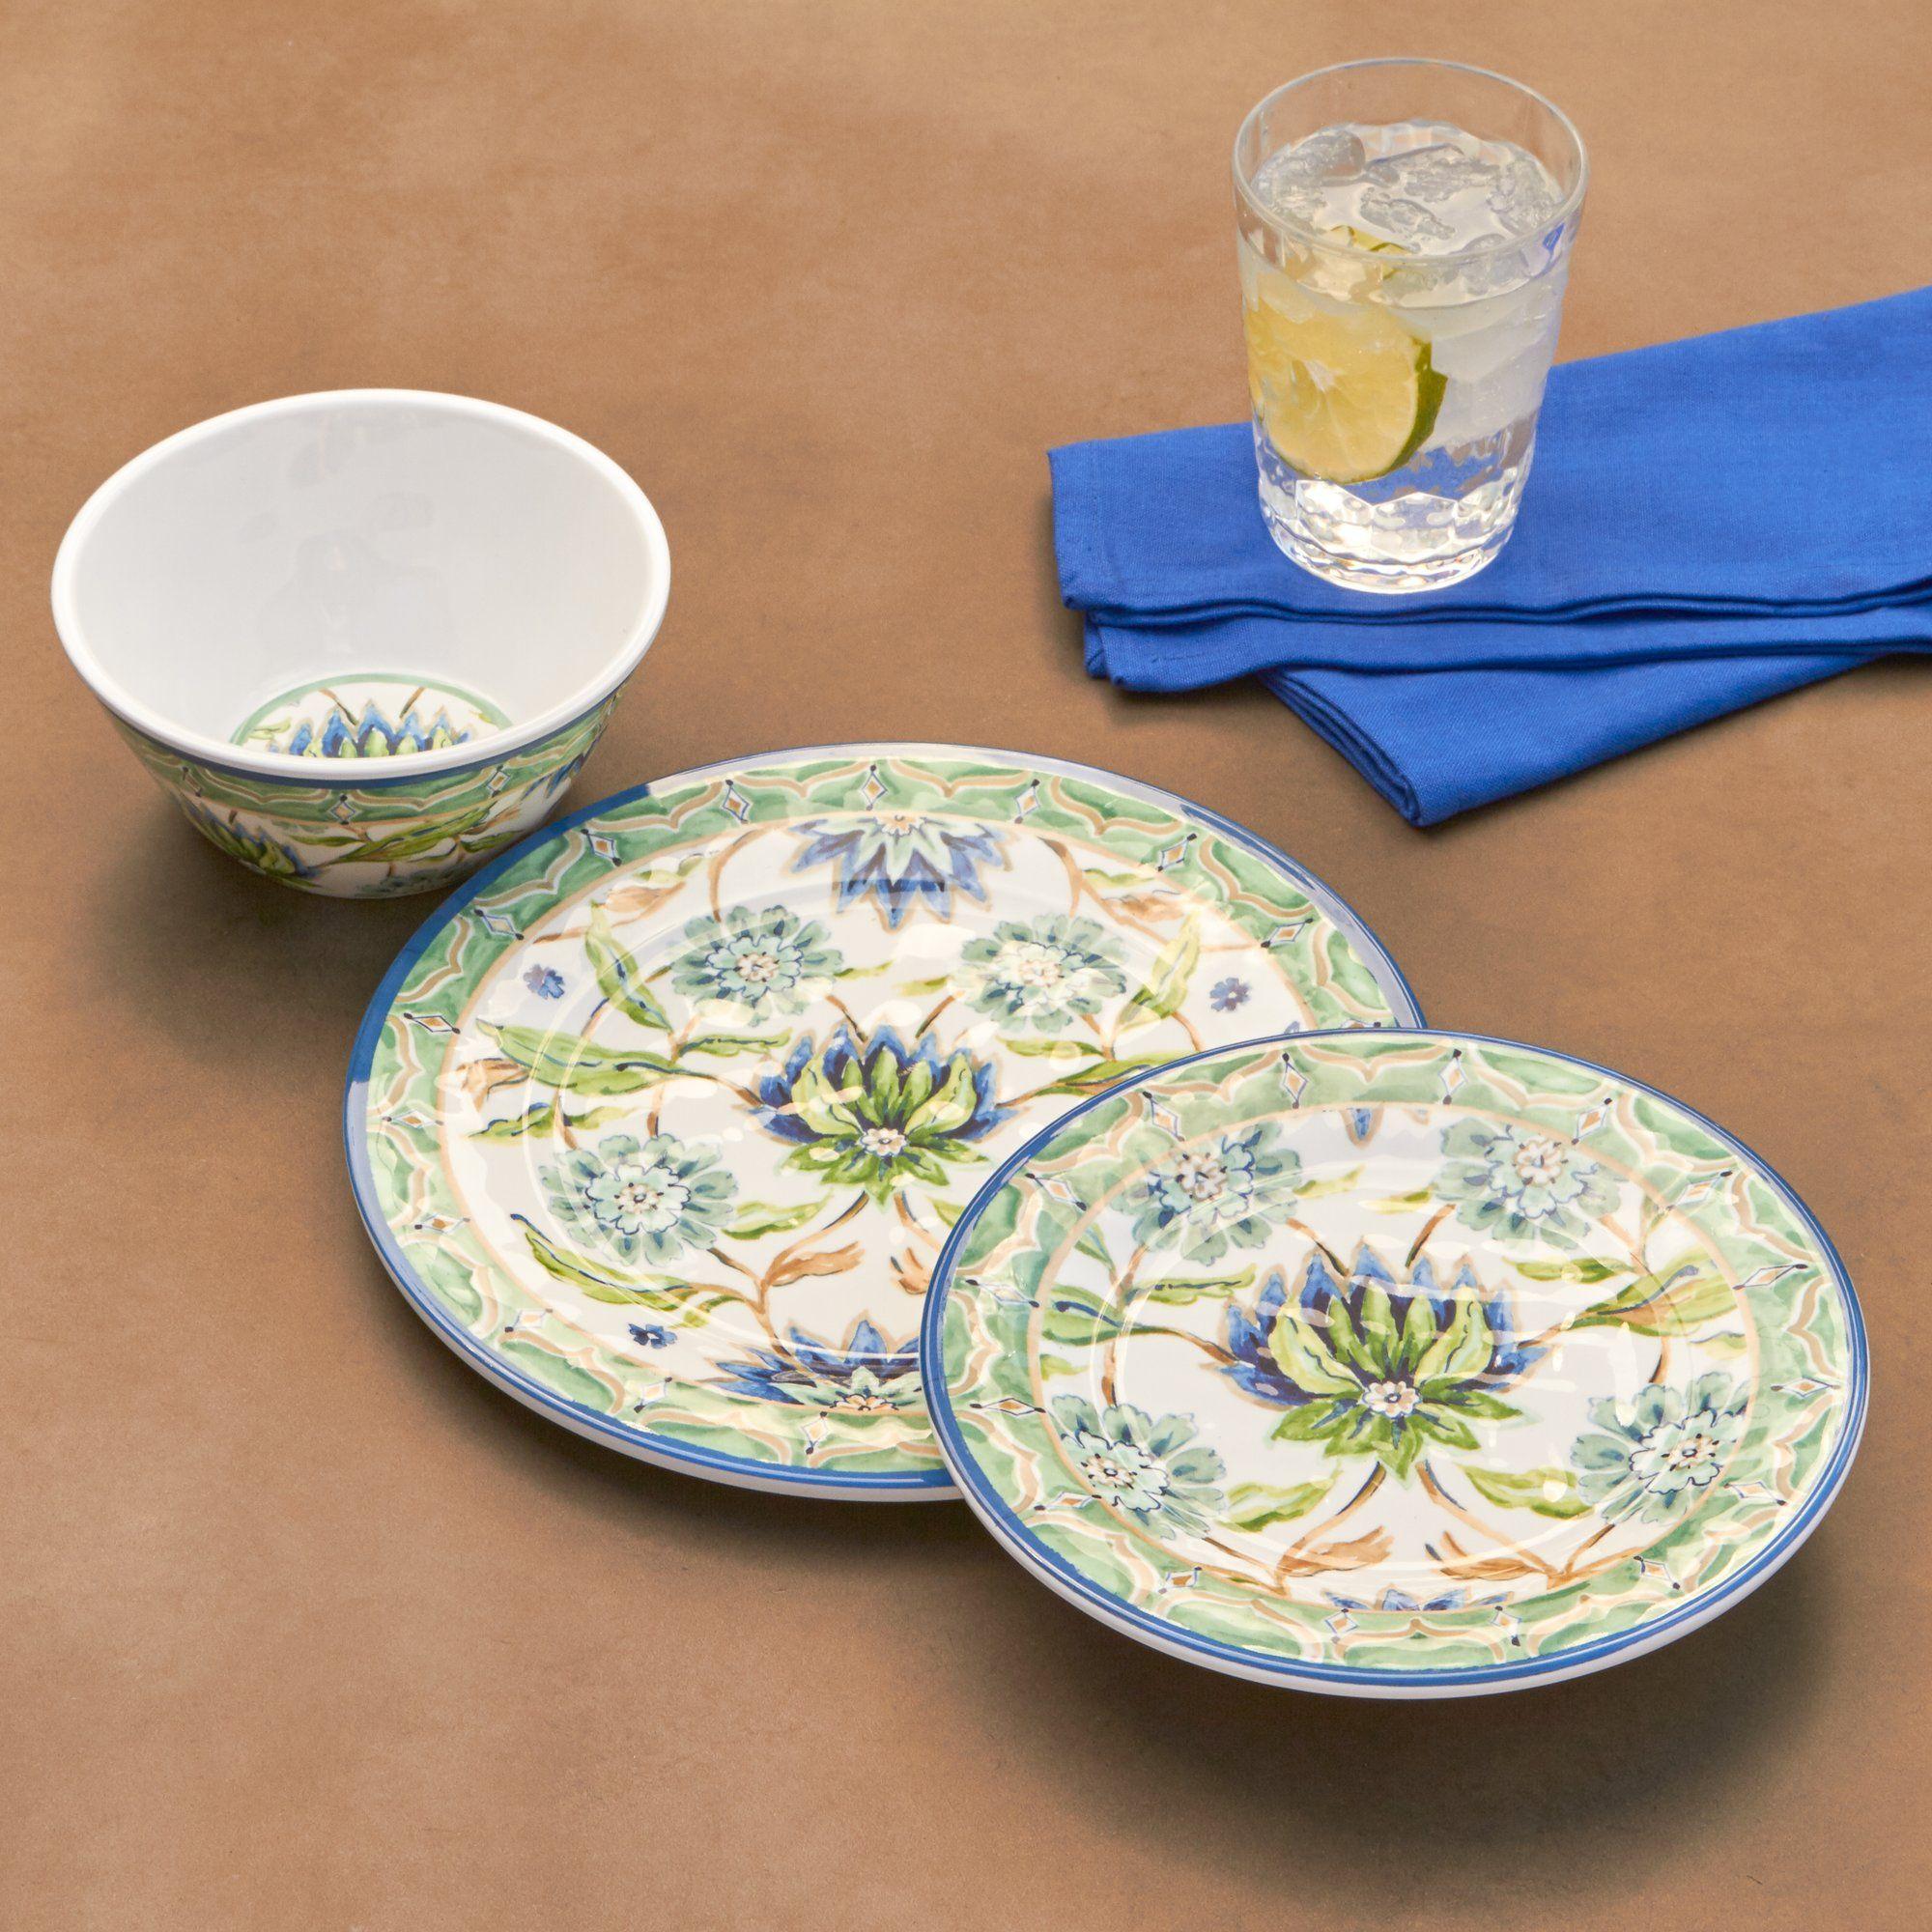 Sanya Melamine 12 Piece Dinnerware Set Service for 4 & Sanya Melamine 12 Piece Dinnerware Set Service for 4 | Sanya ...